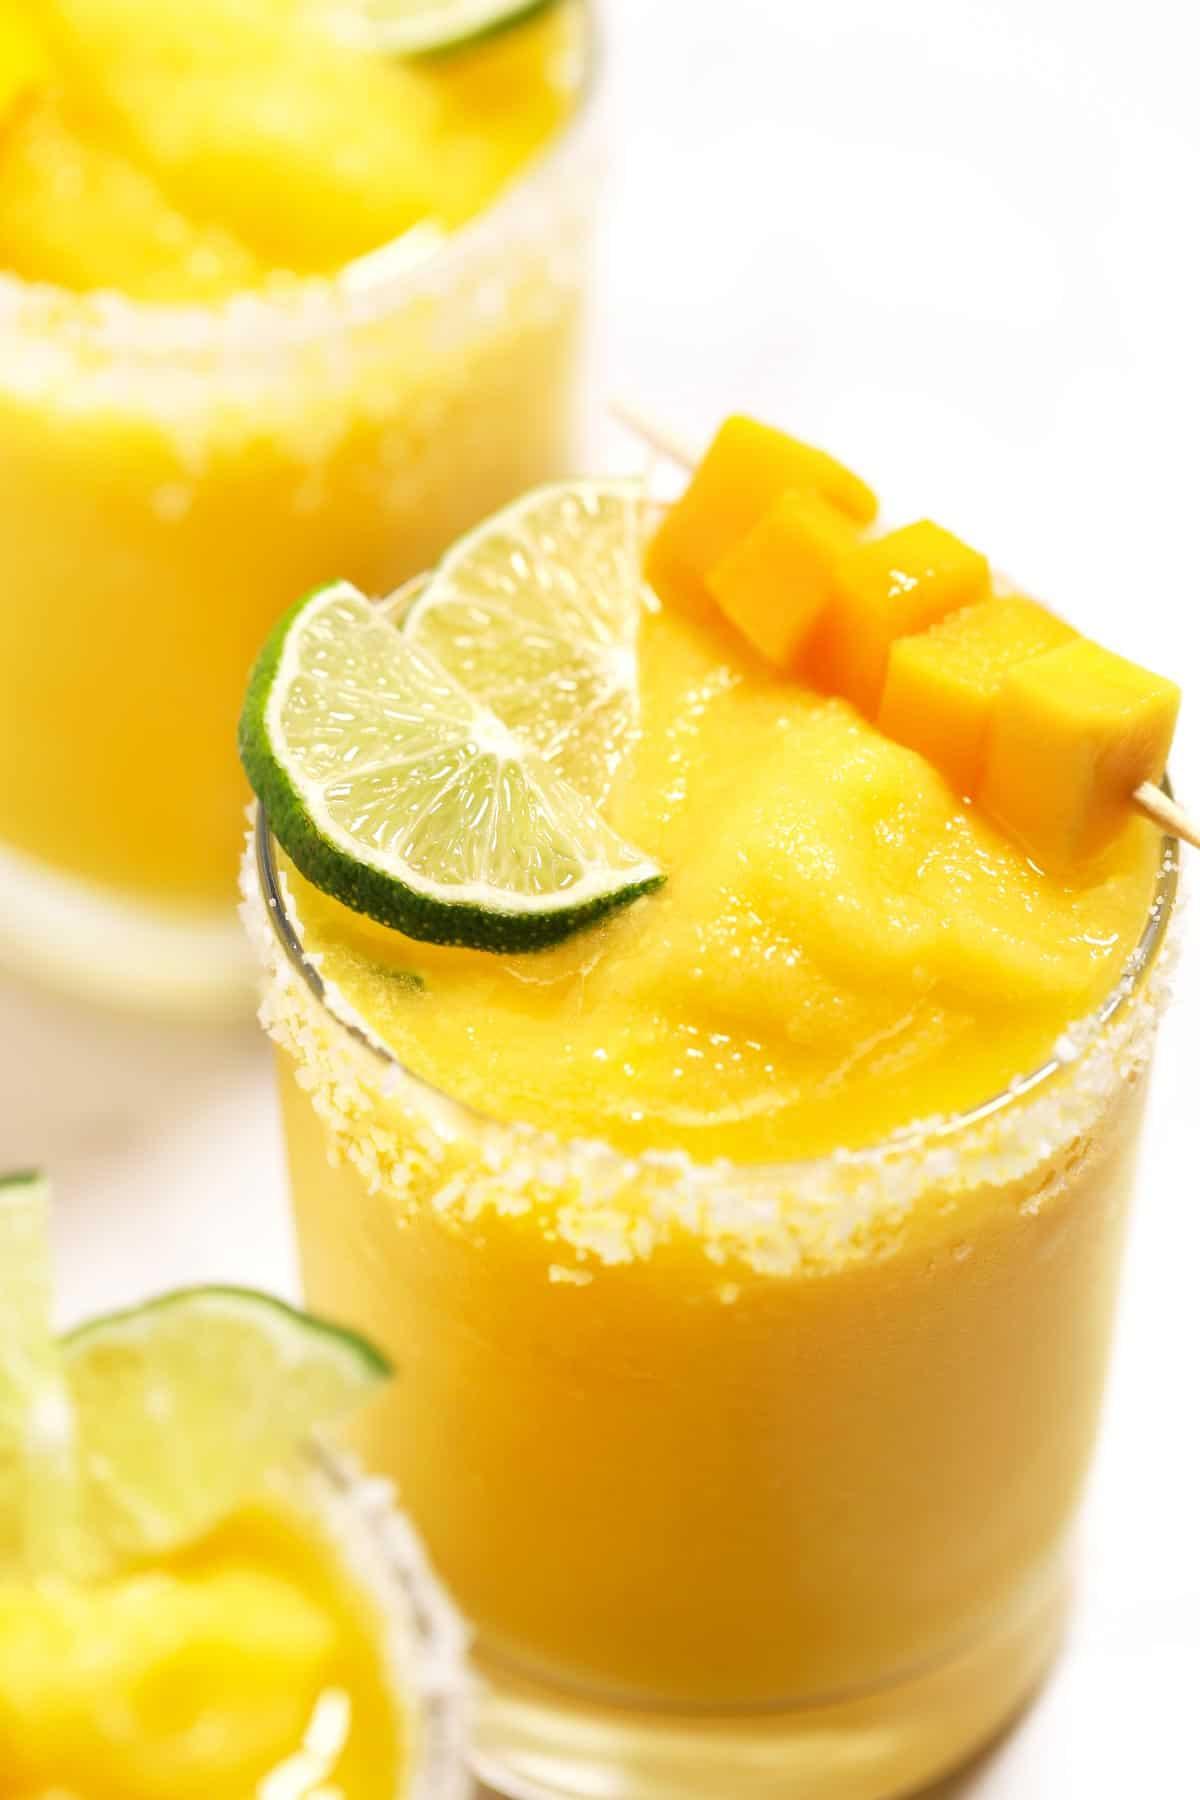 Mango margaritas garnished with lime, salt, and fresh mango.